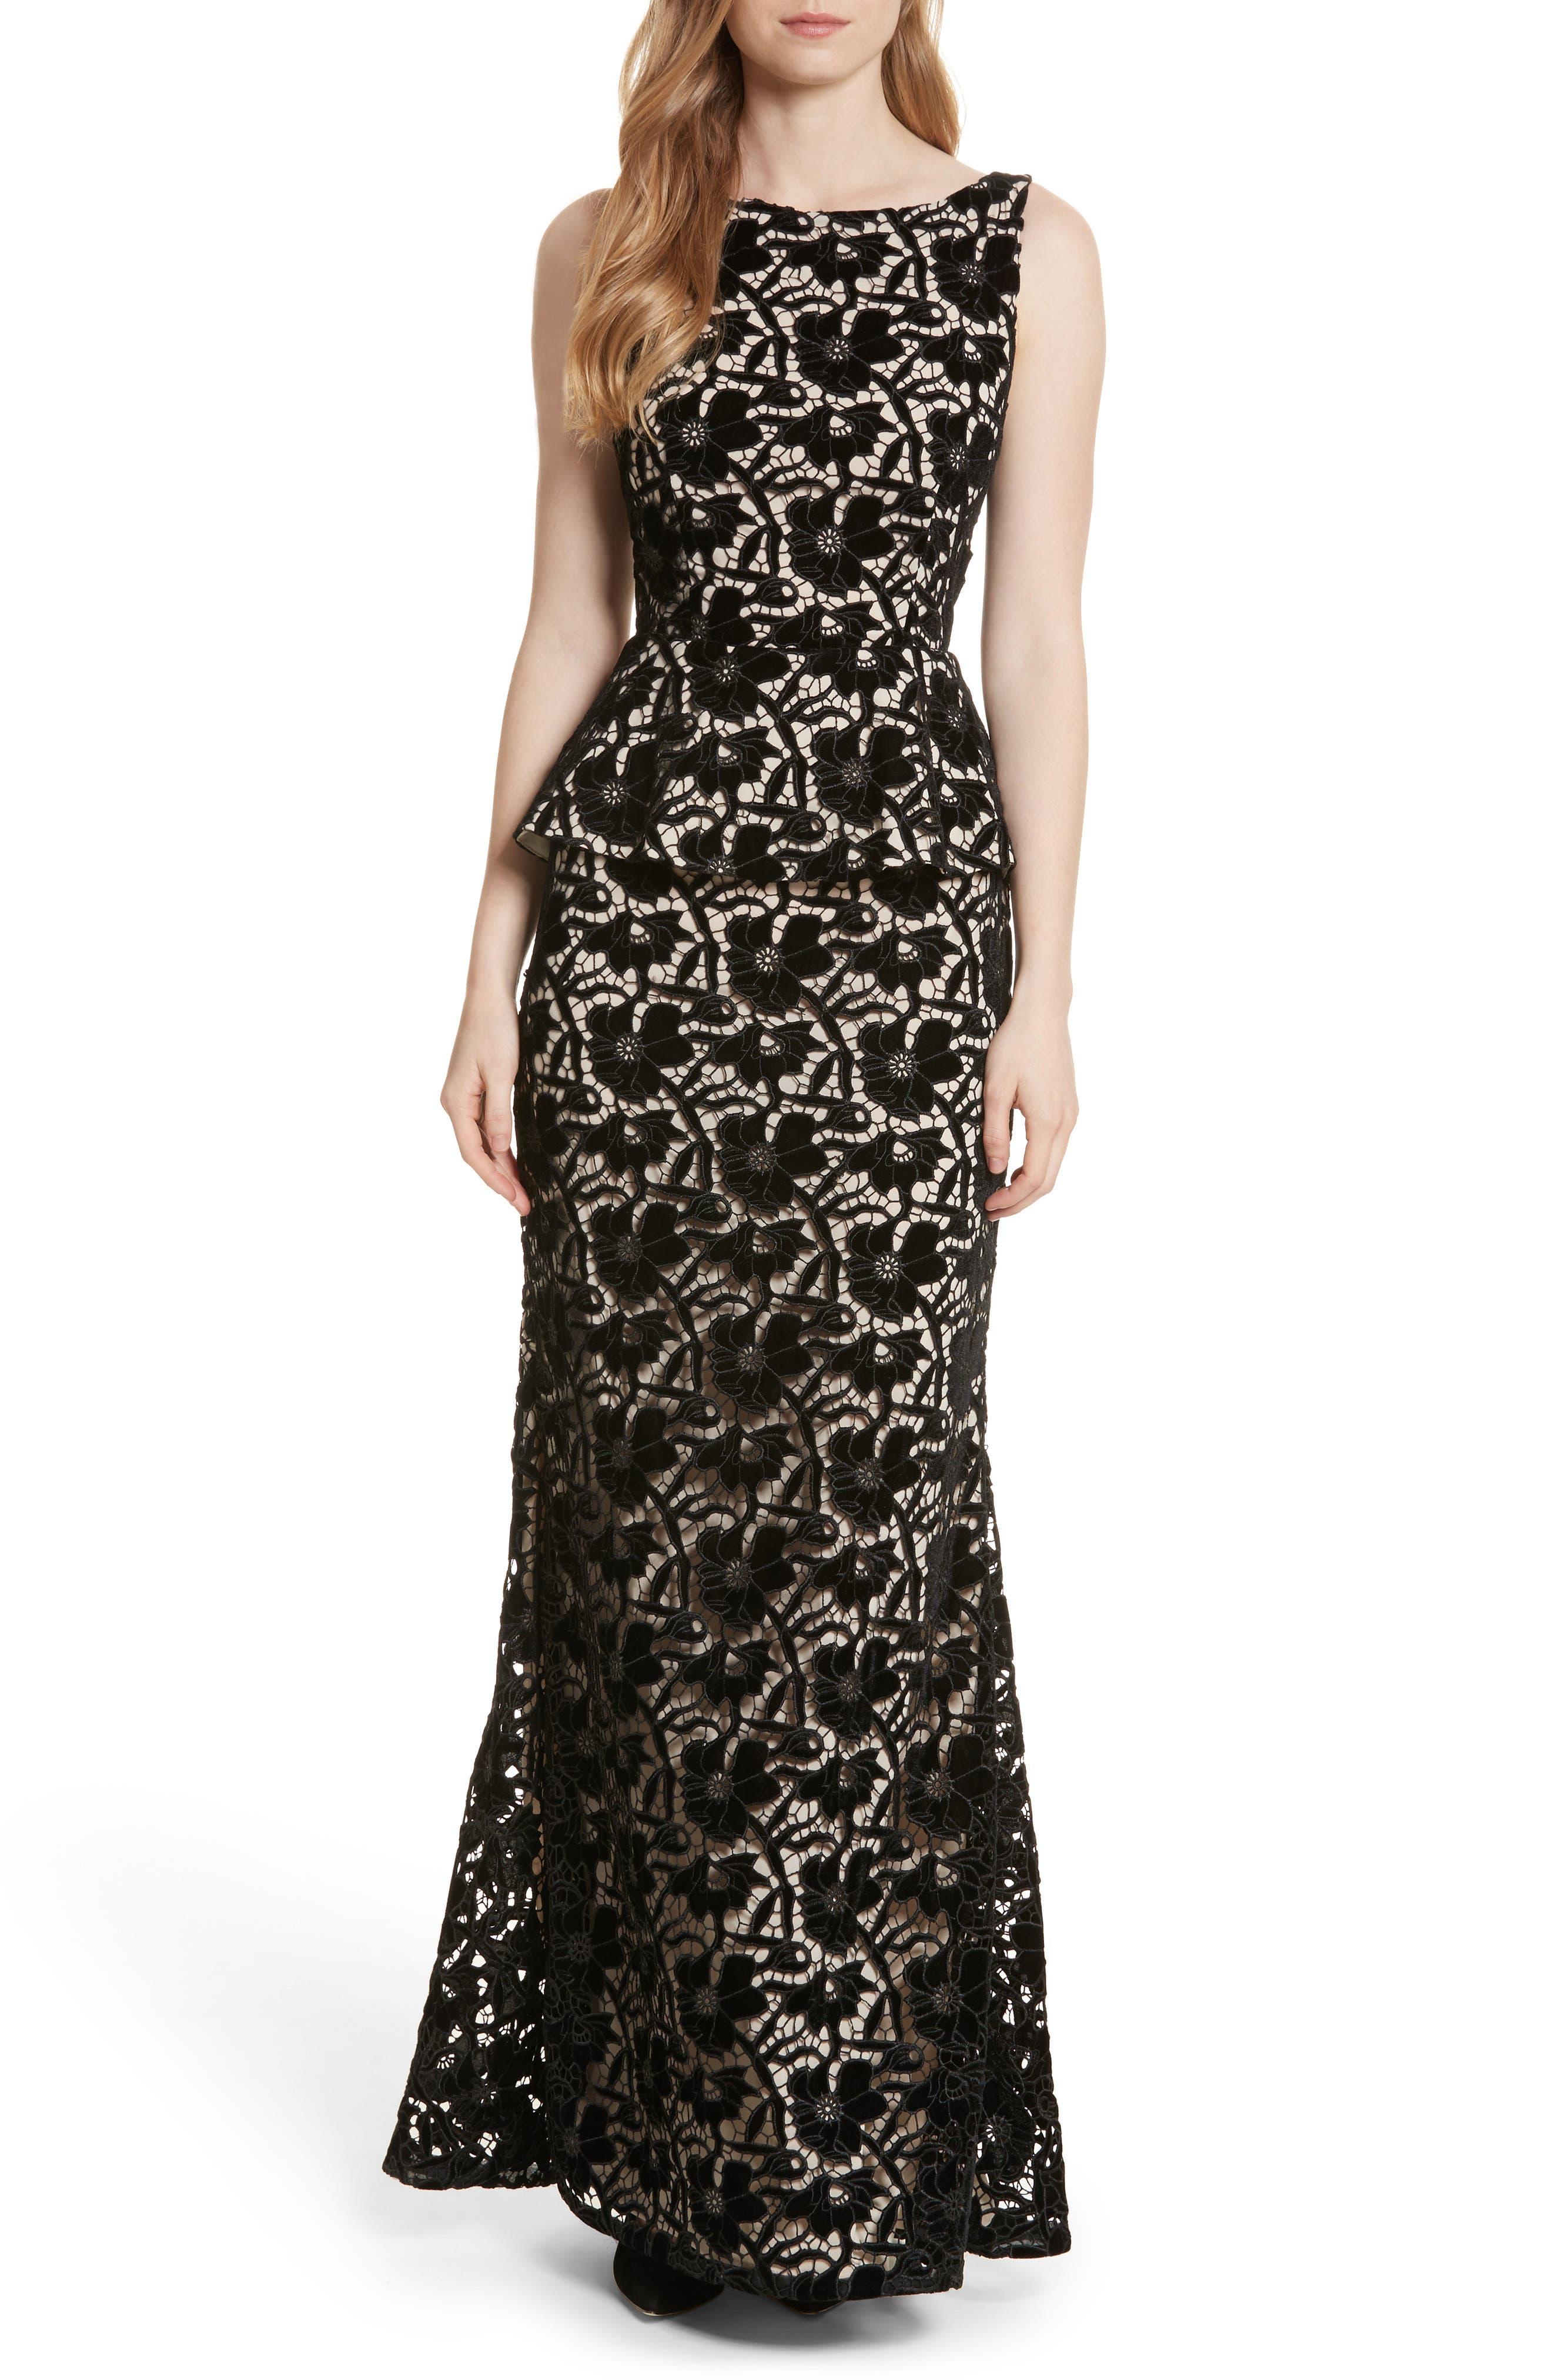 Alice + Olivia Jae Peplum Open Back Dress